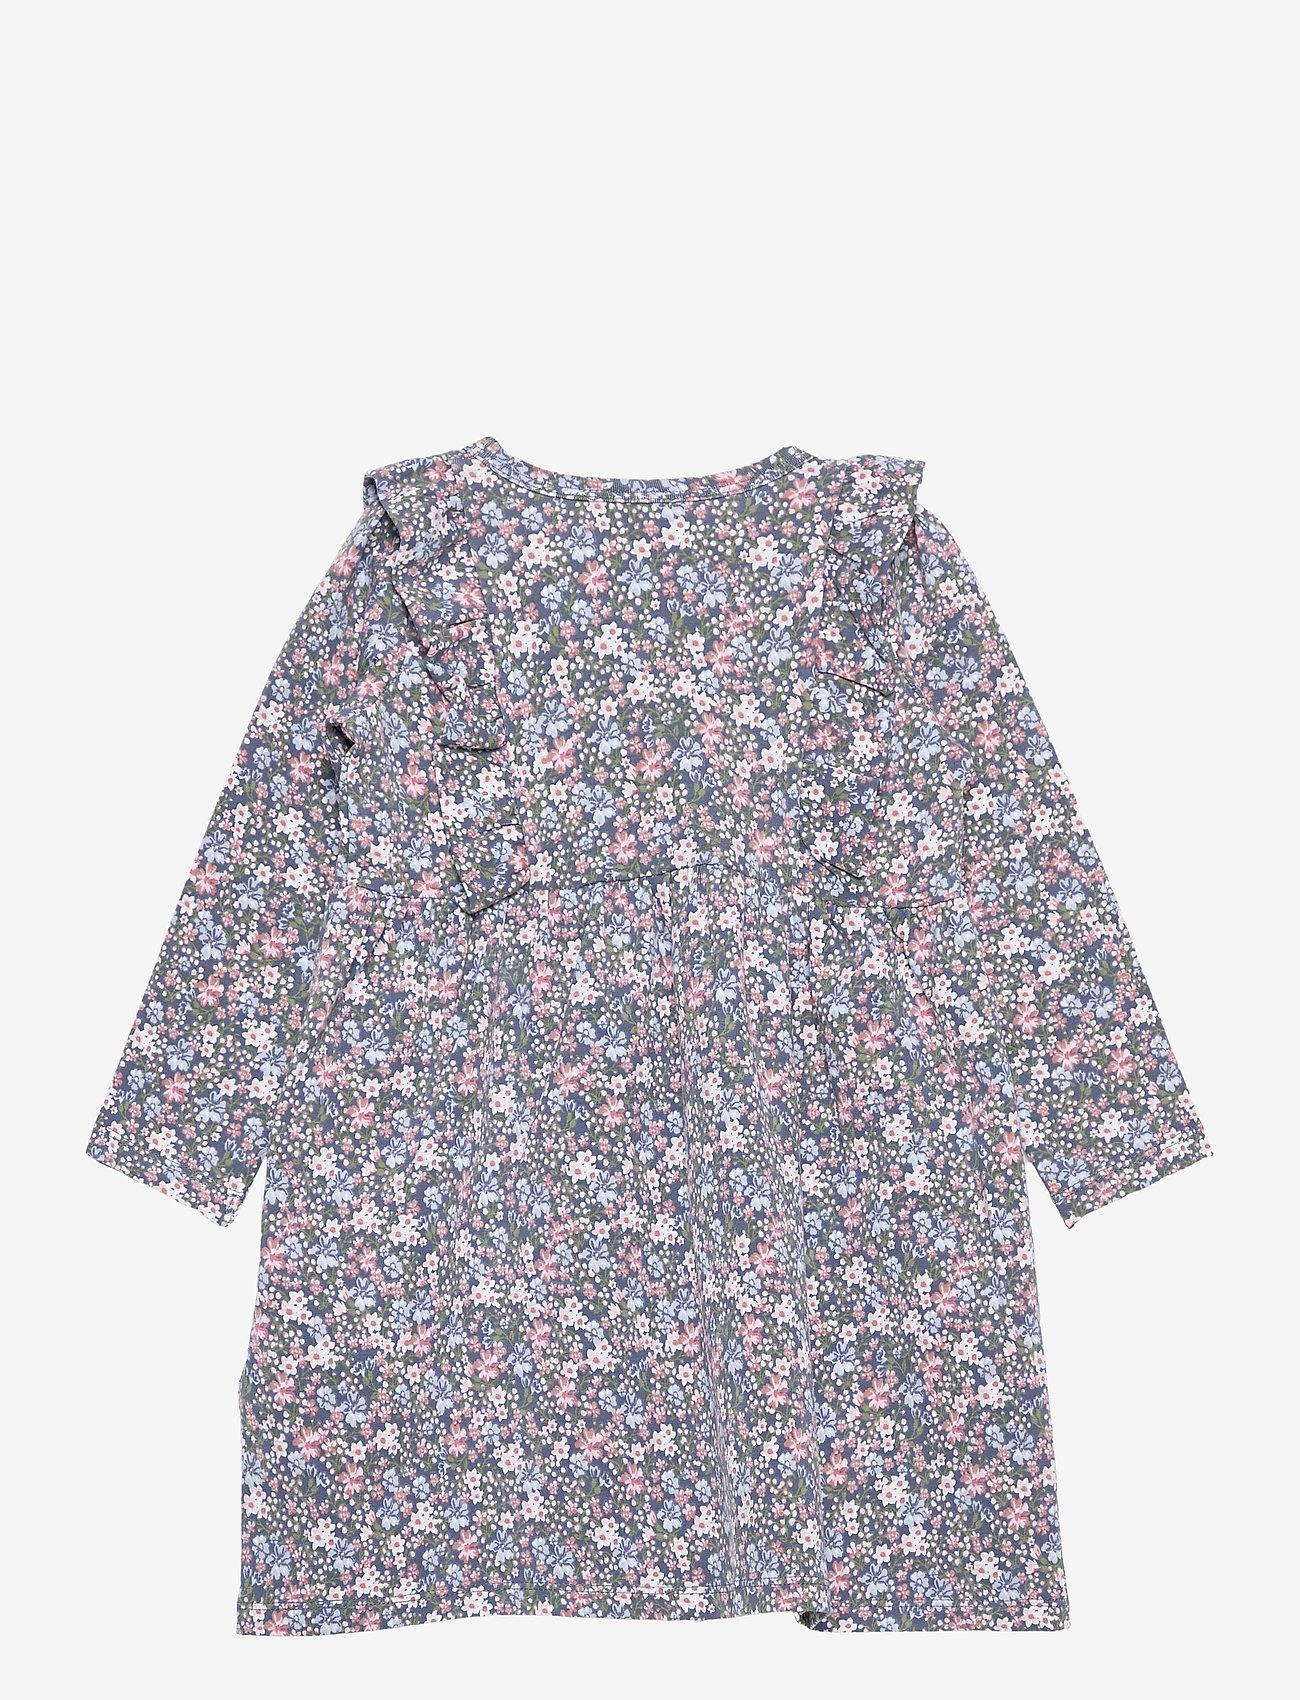 Hust & Claire - Delilah - Dress - jurken - peony blue - 1